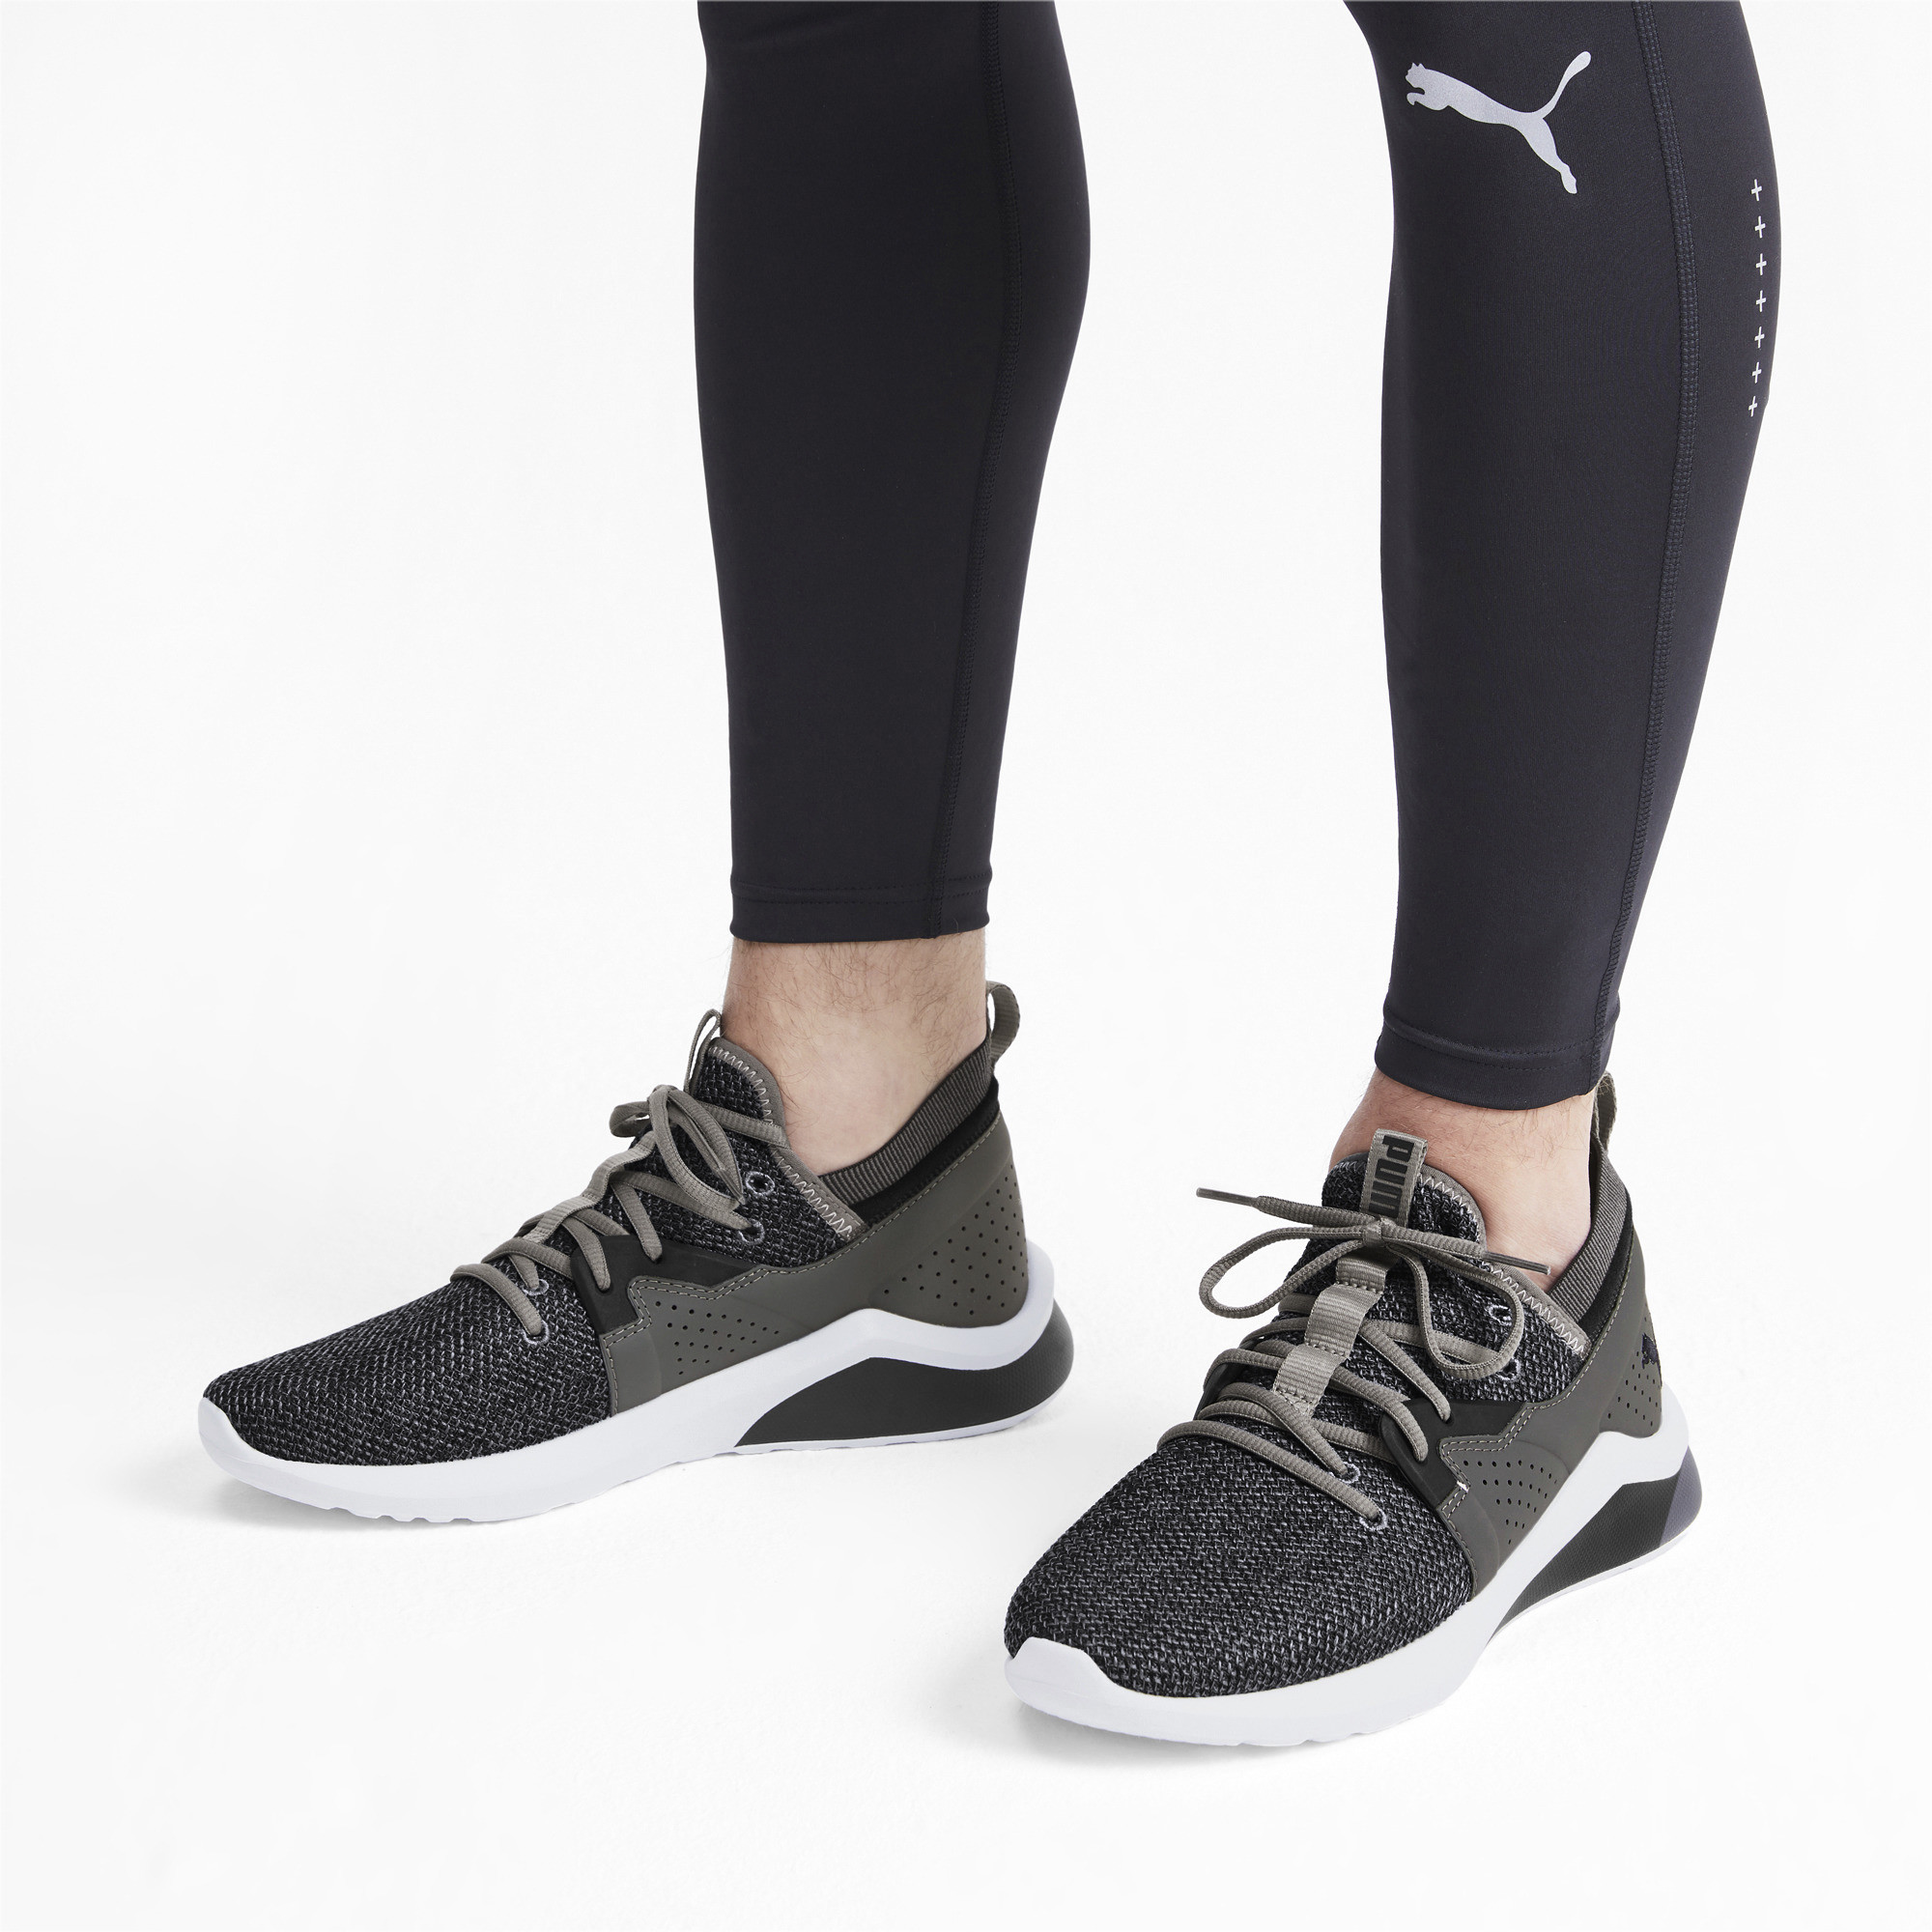 PUMA-Emergence-Men-039-s-Sneakers-Men-Shoe-Running thumbnail 17